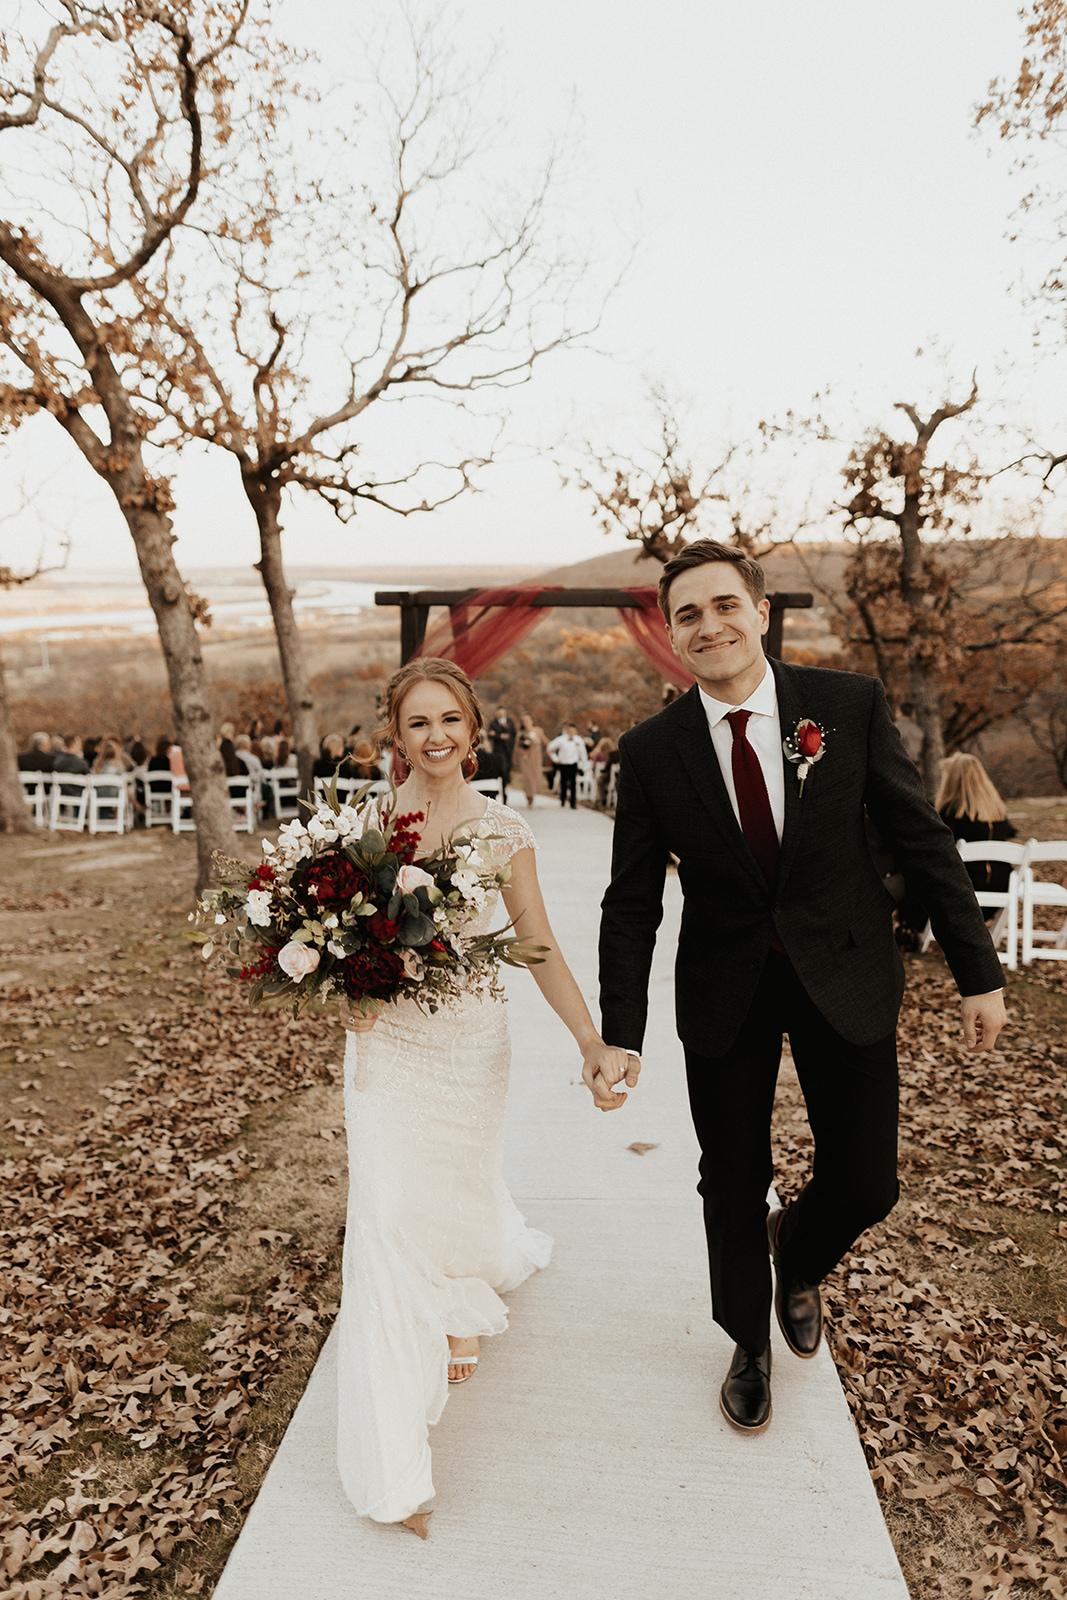 Best Wedding Venue in Tulsa Bixby Dream Point Ranch 56.jpg